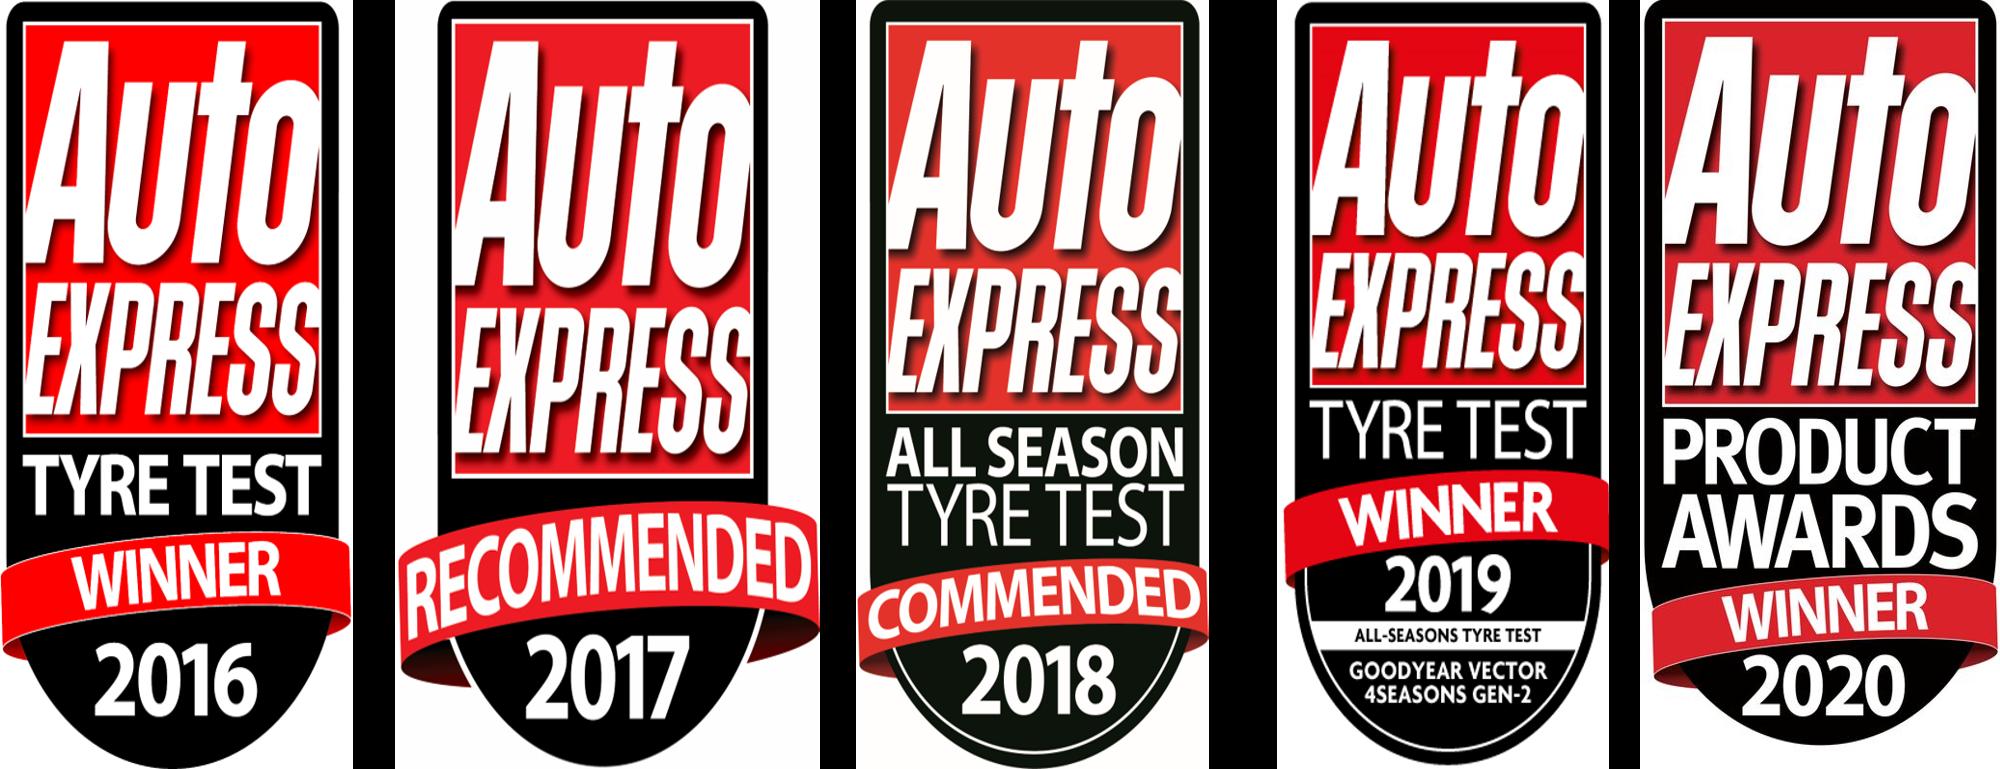 Auto Express Product Awards Winner 2020 Gen-2